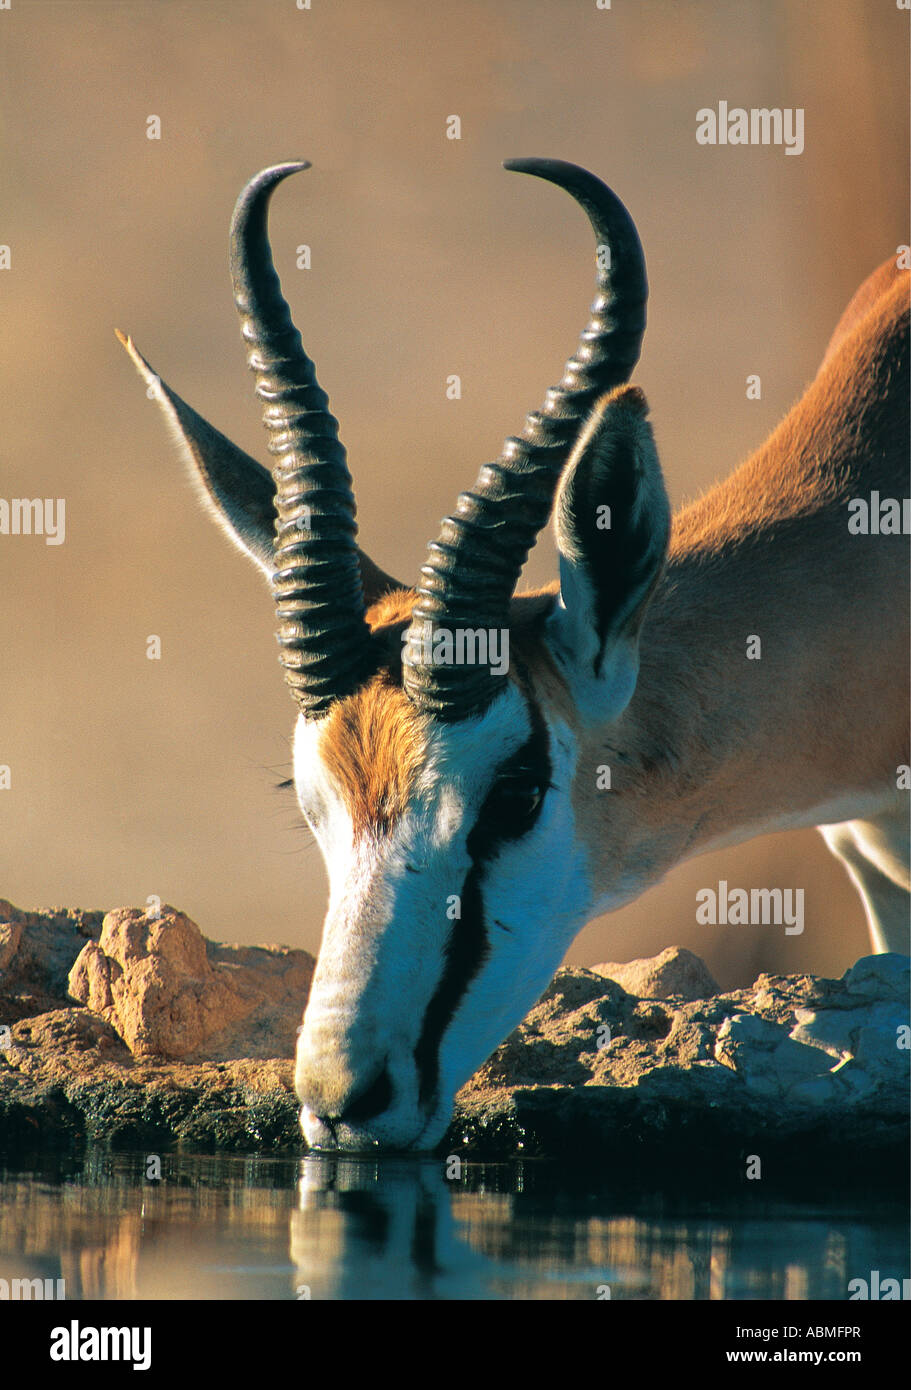 Springbok drinking at a pool Kalahari Gemsbok National Park South Africa - Stock Image